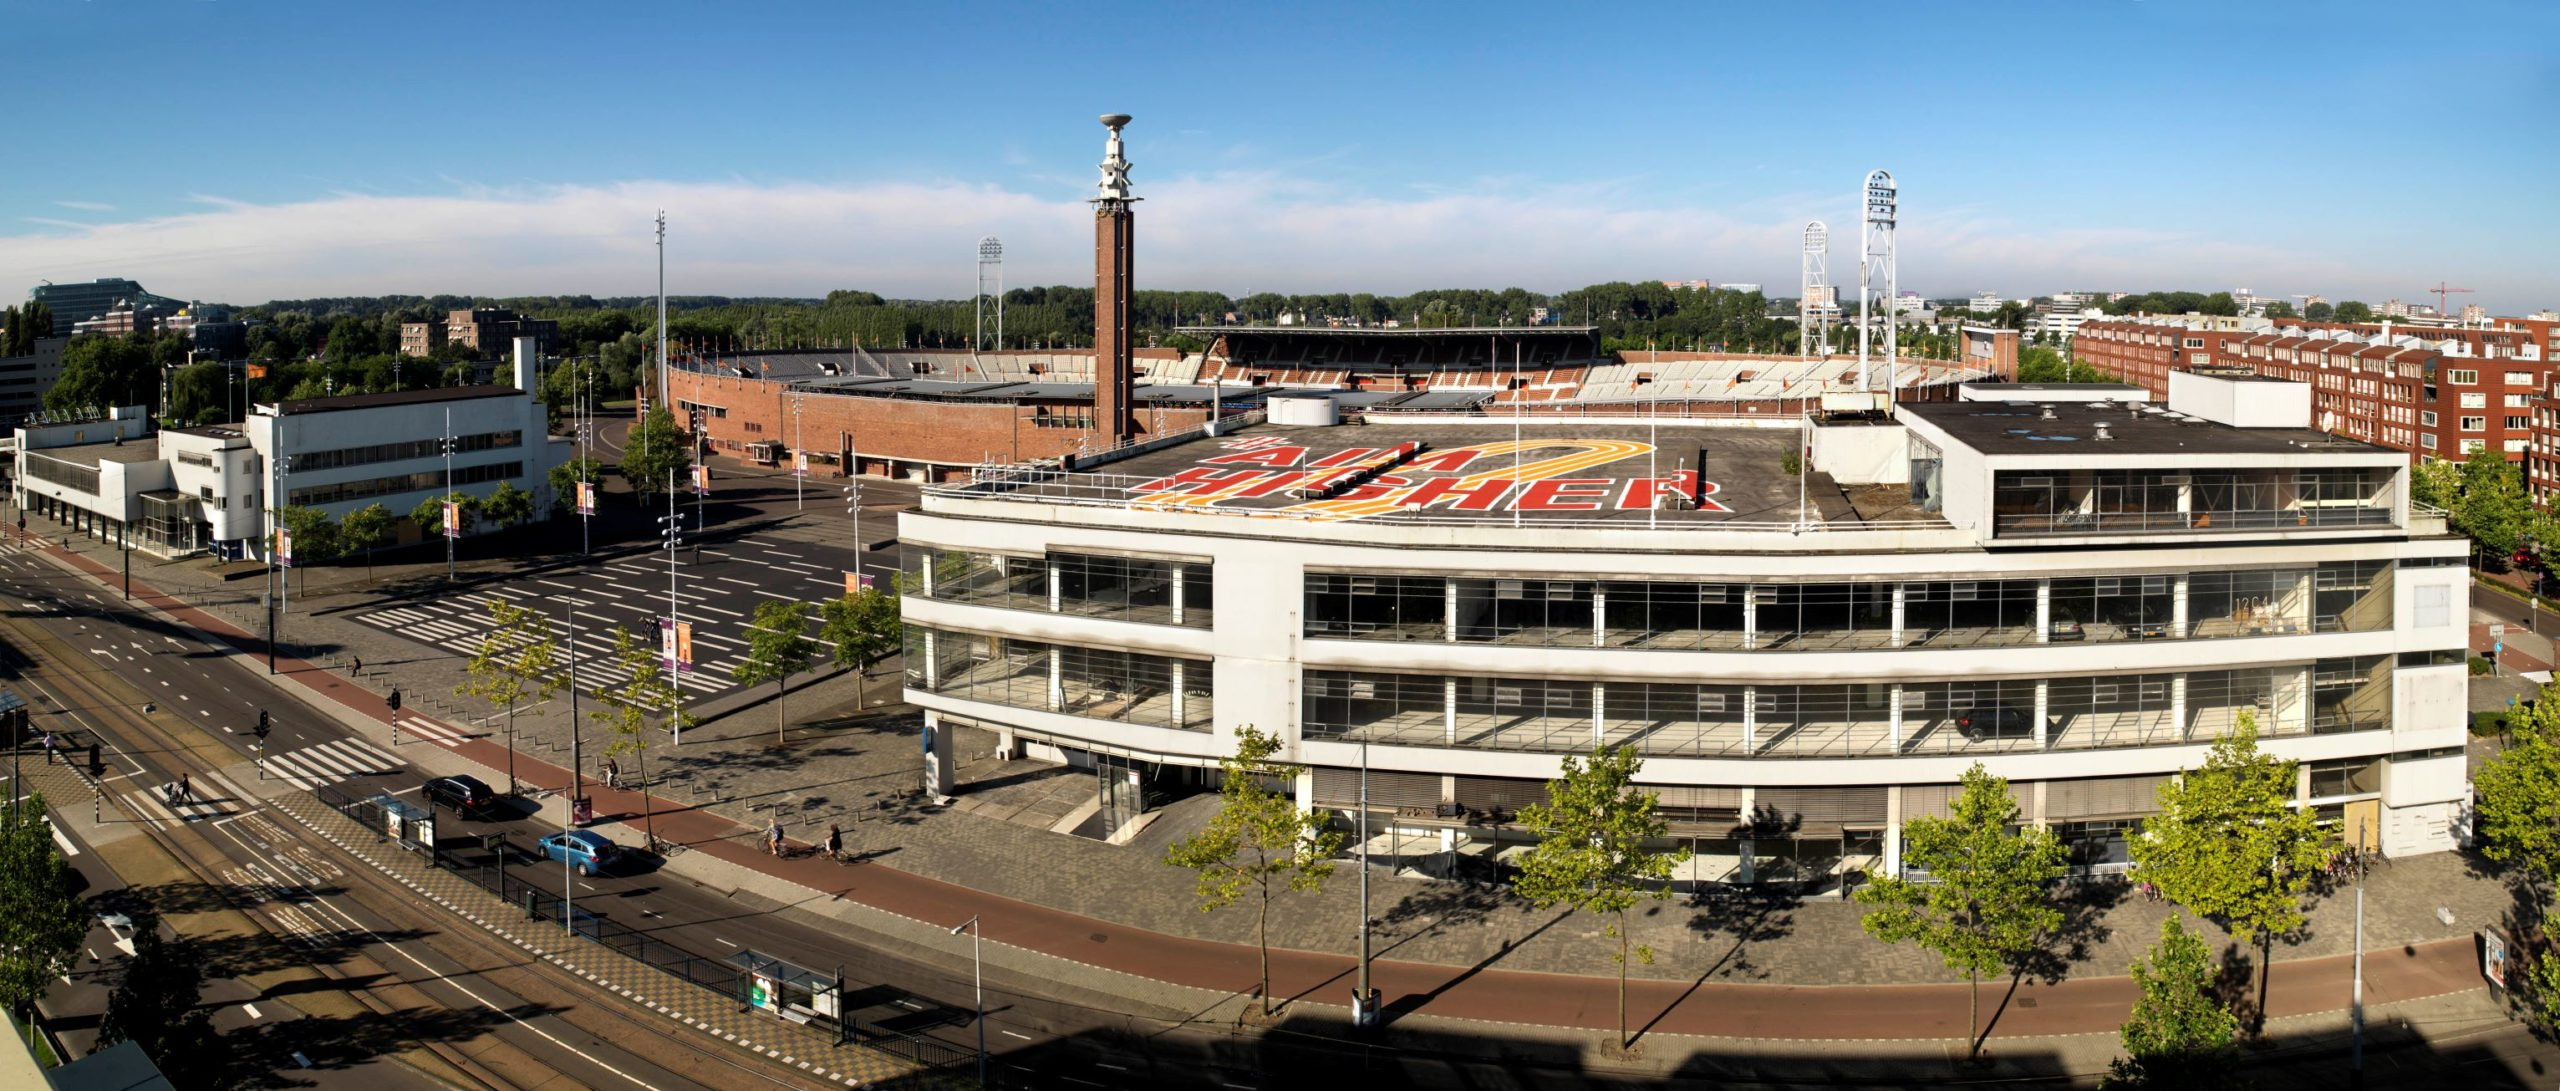 The Garage Amsterdam Citroen